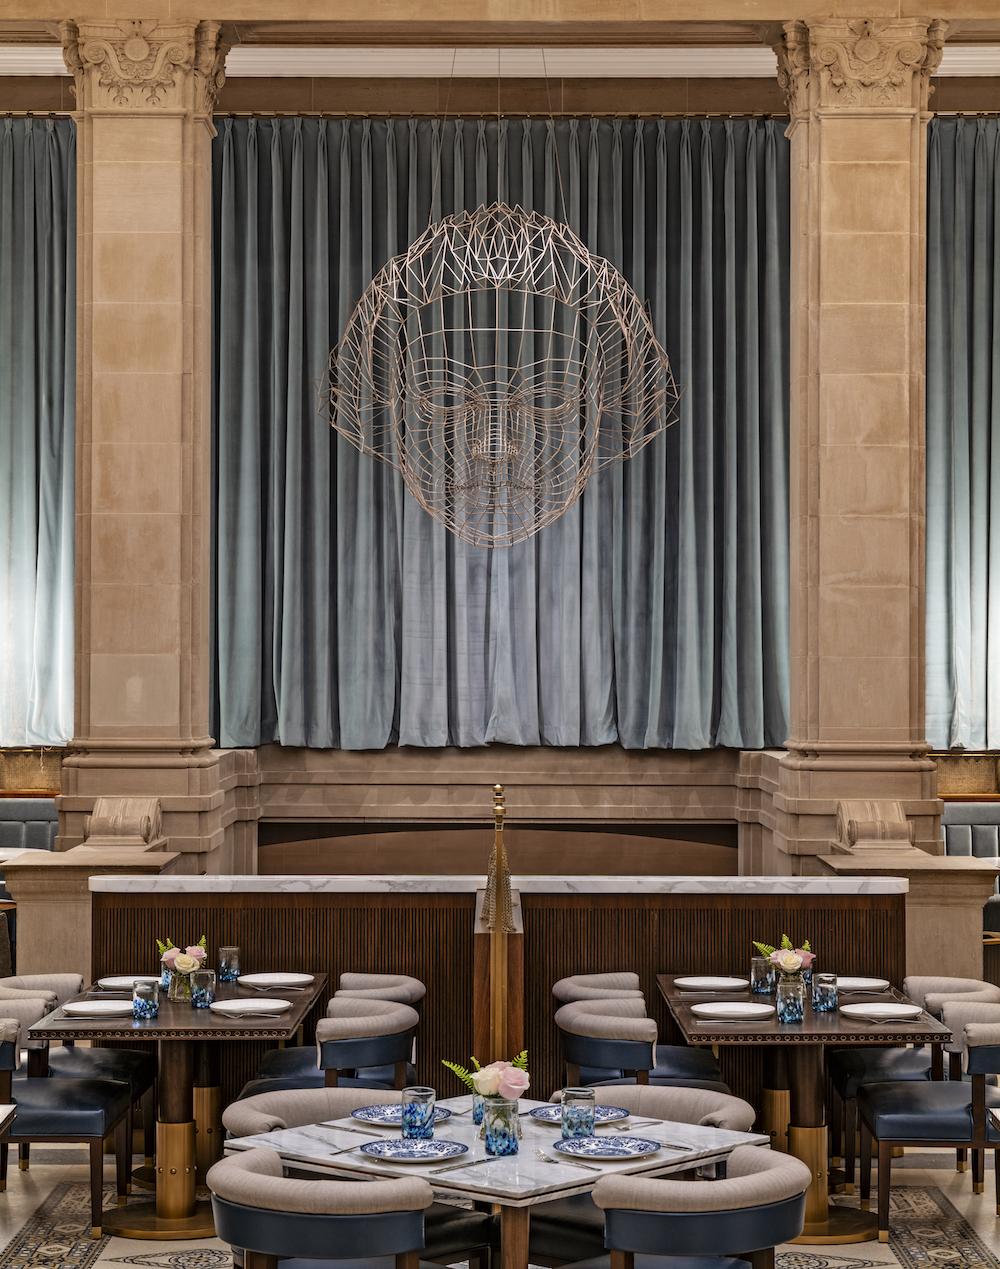 Image caption: The new Grana restaurant. | Image credit: Langham Hotels